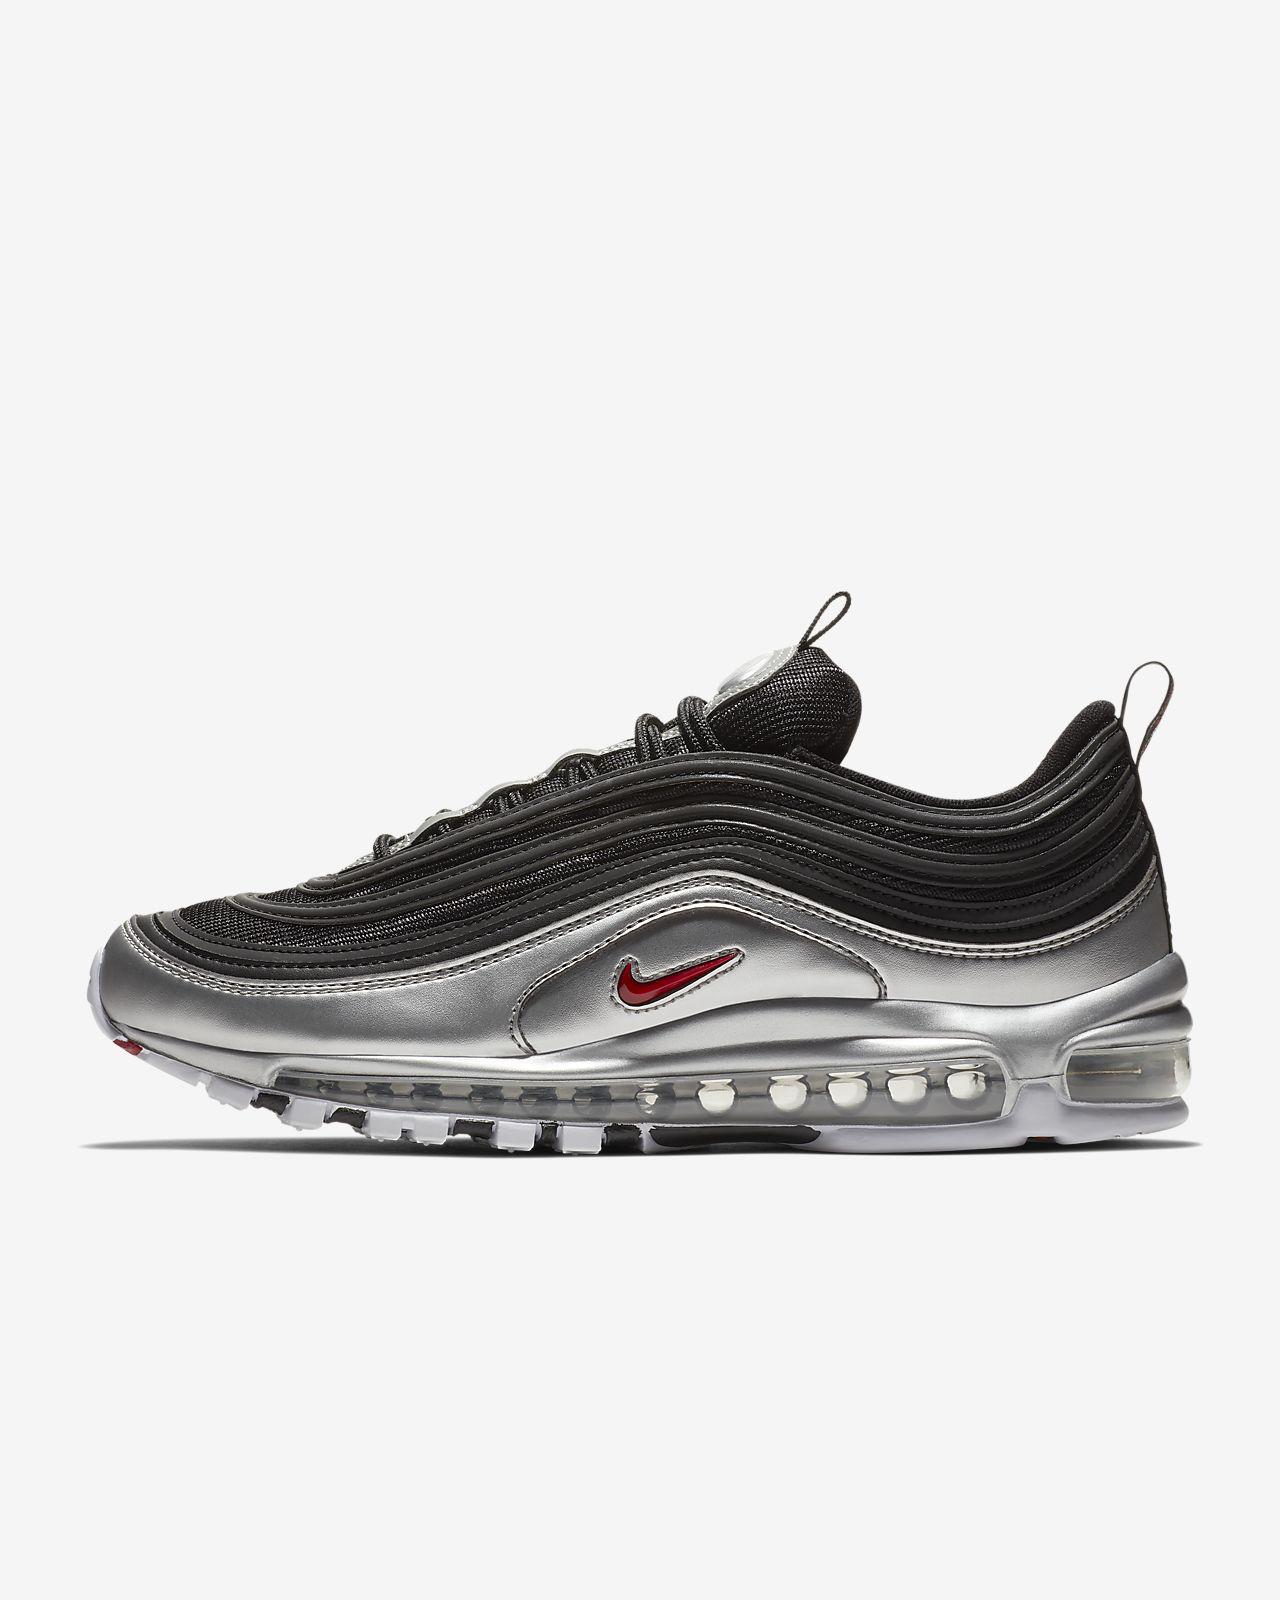 save off 551d5 aa512 ... Nike Air Max 97 QS Men s Shoe